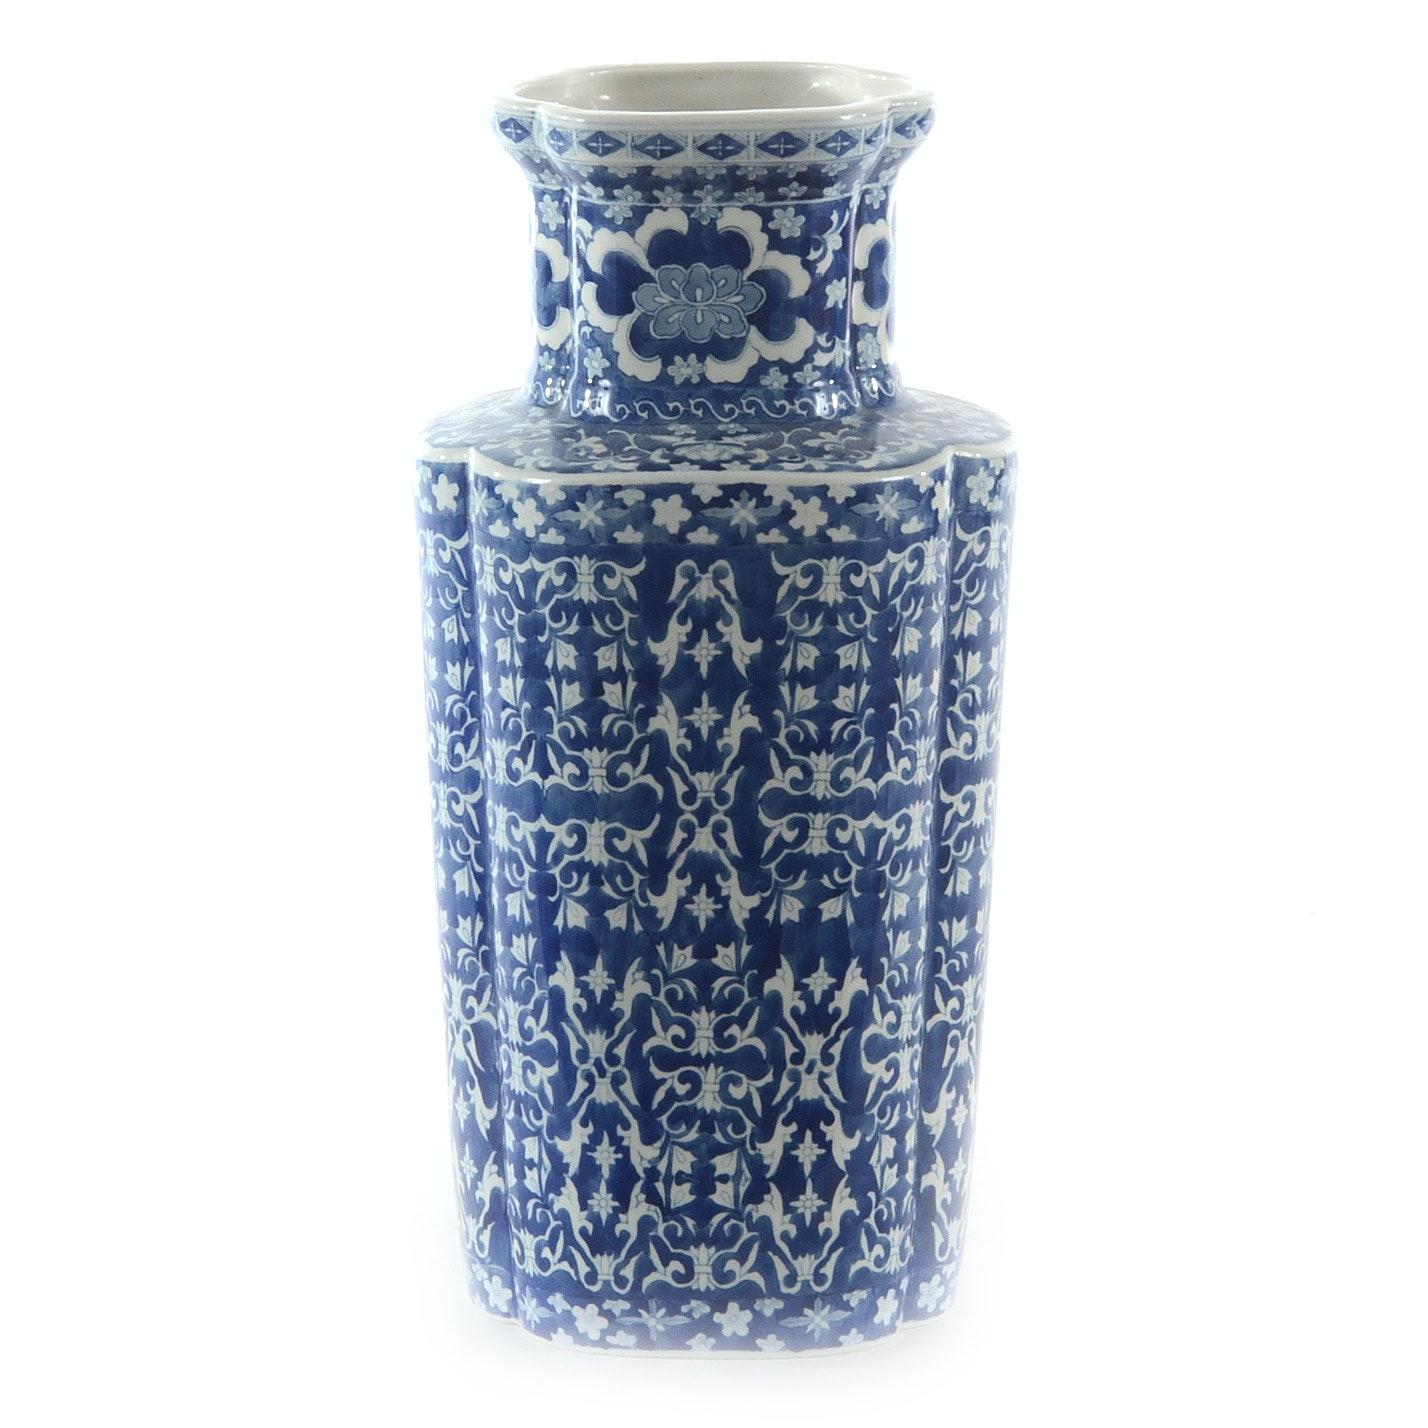 Blue and White Chinese Porcelain Vase